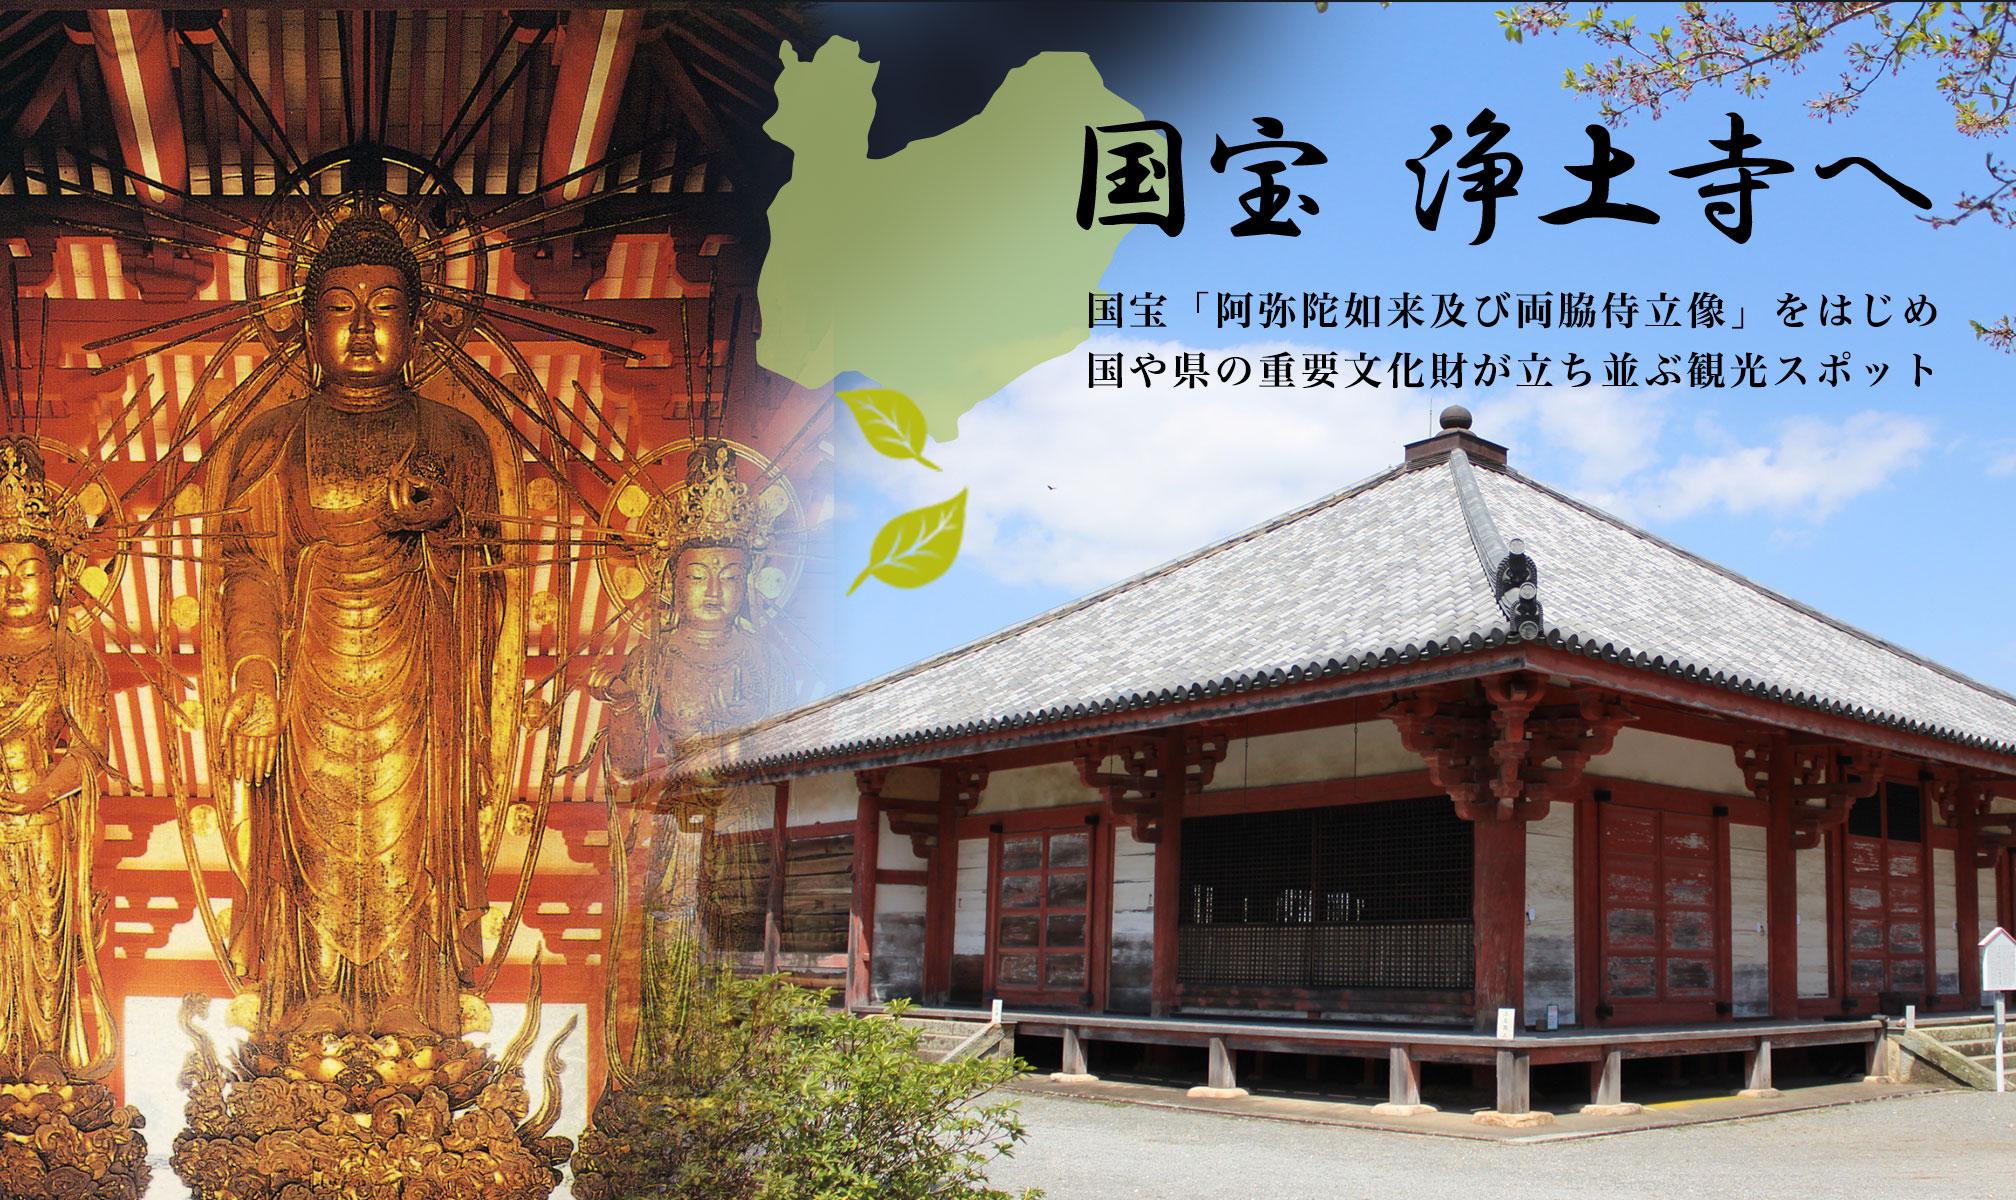 国宝 浄土寺へ